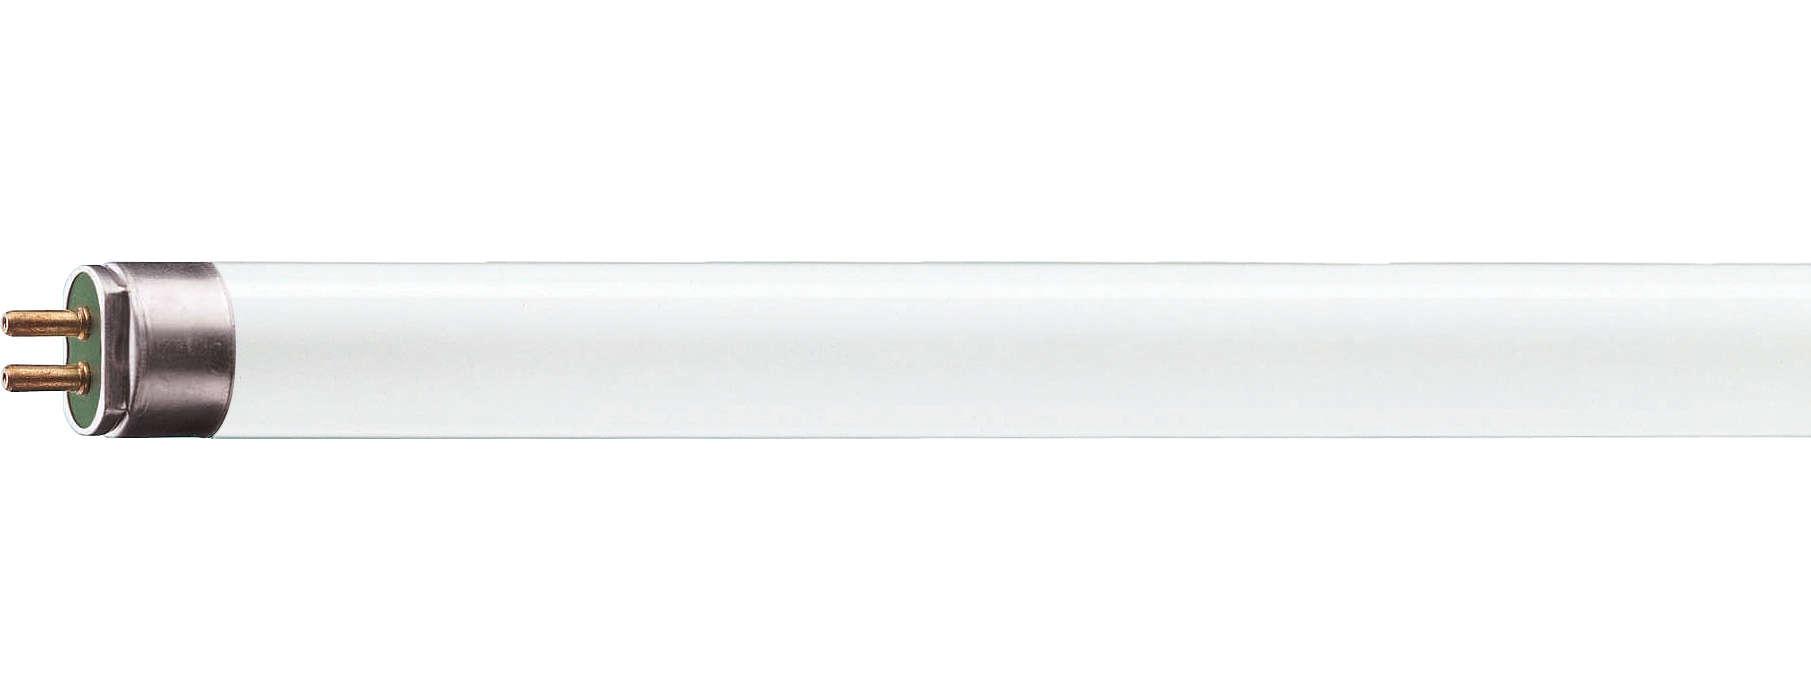 Højeffektive lysstofrør